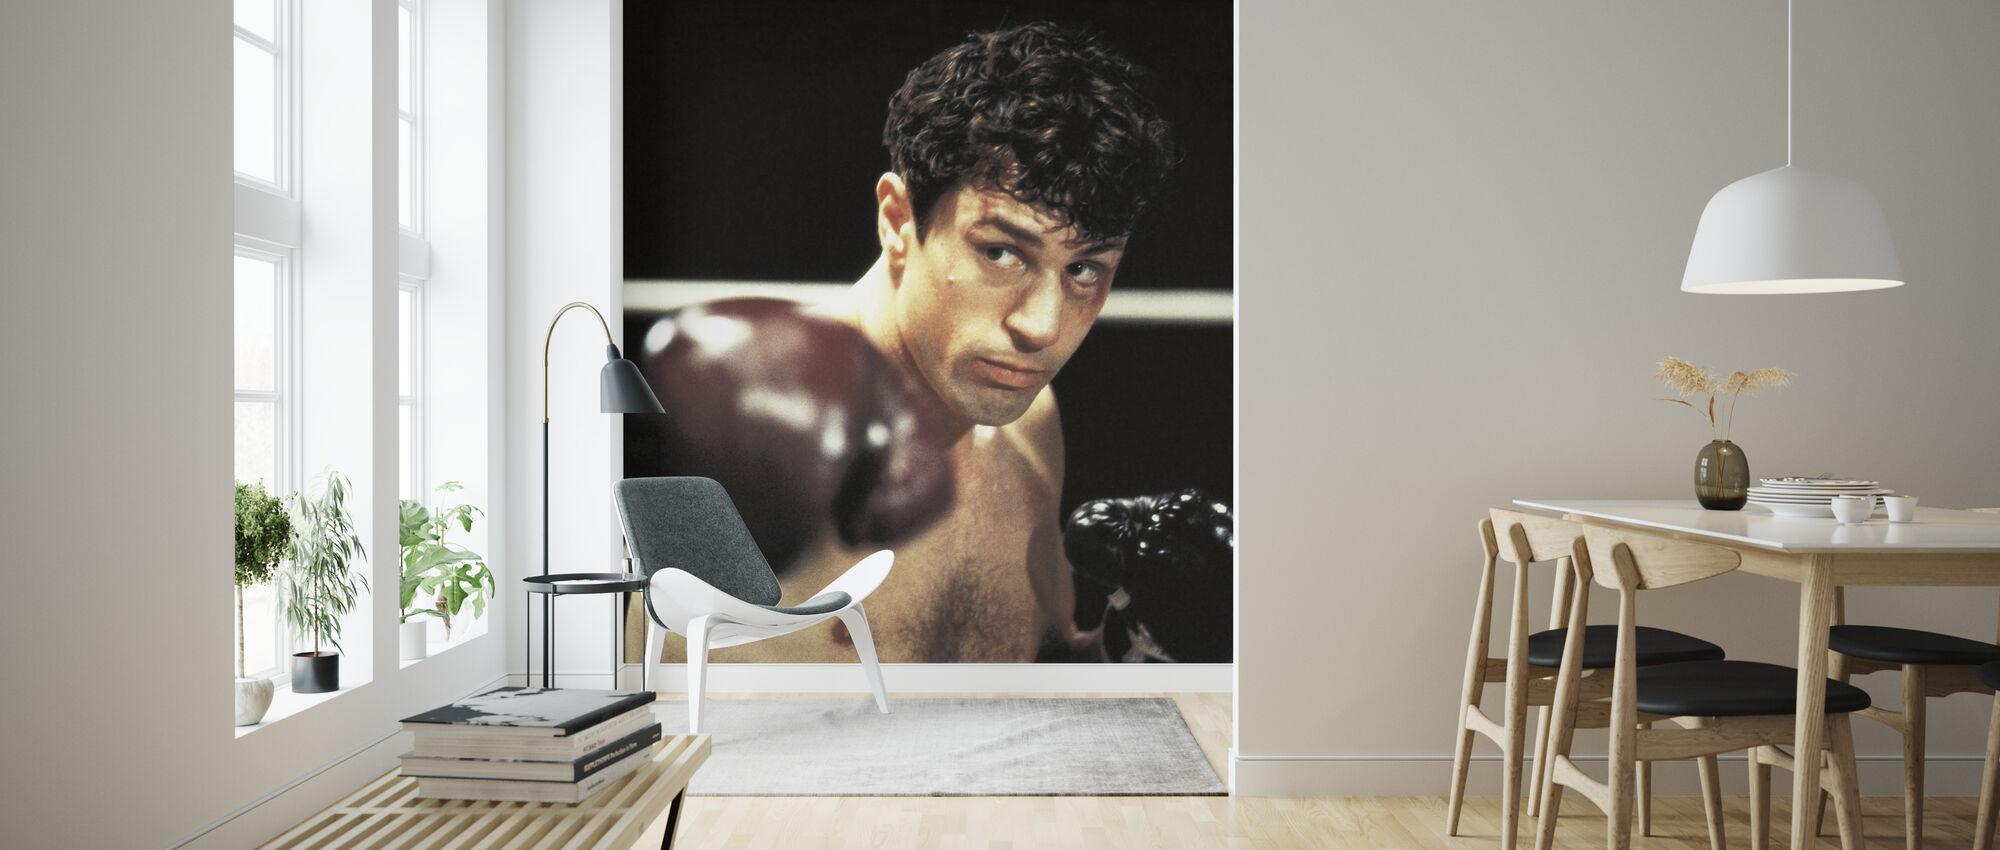 Raging Bull boksing - Robert De Niro - Tapet - Stue